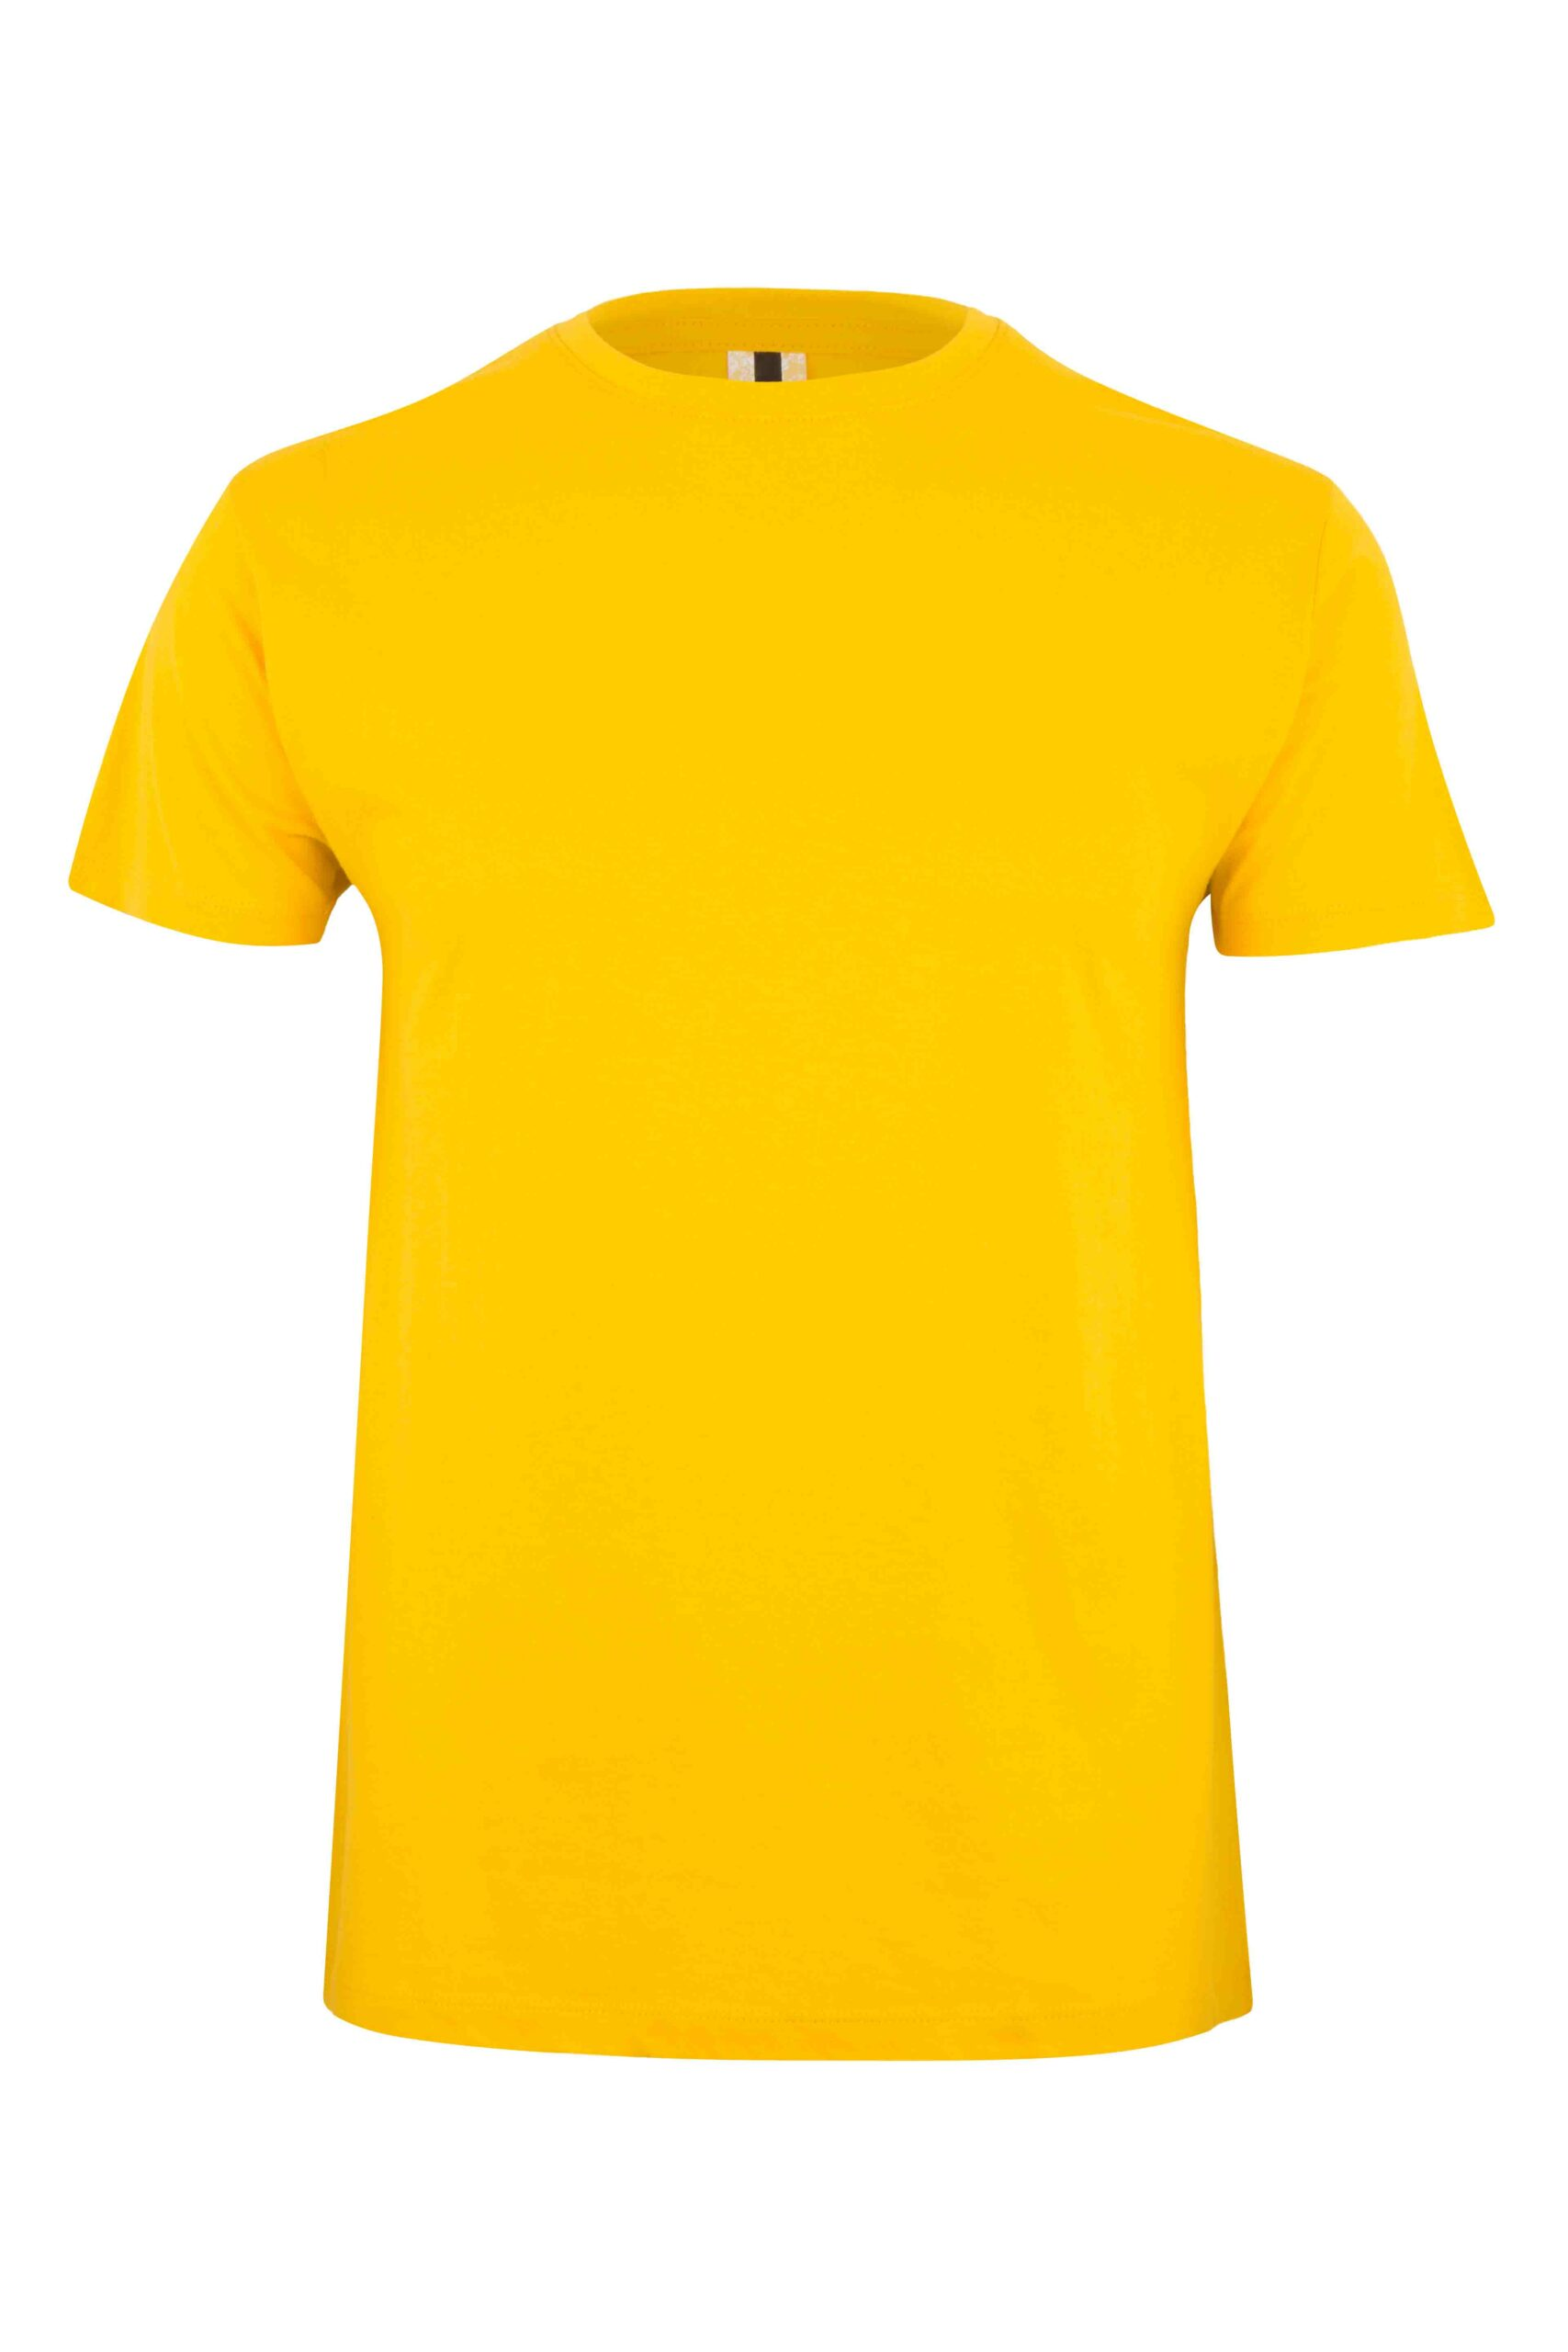 Mukua Mk022cv Camiseta Manga Corta 150gr Gold